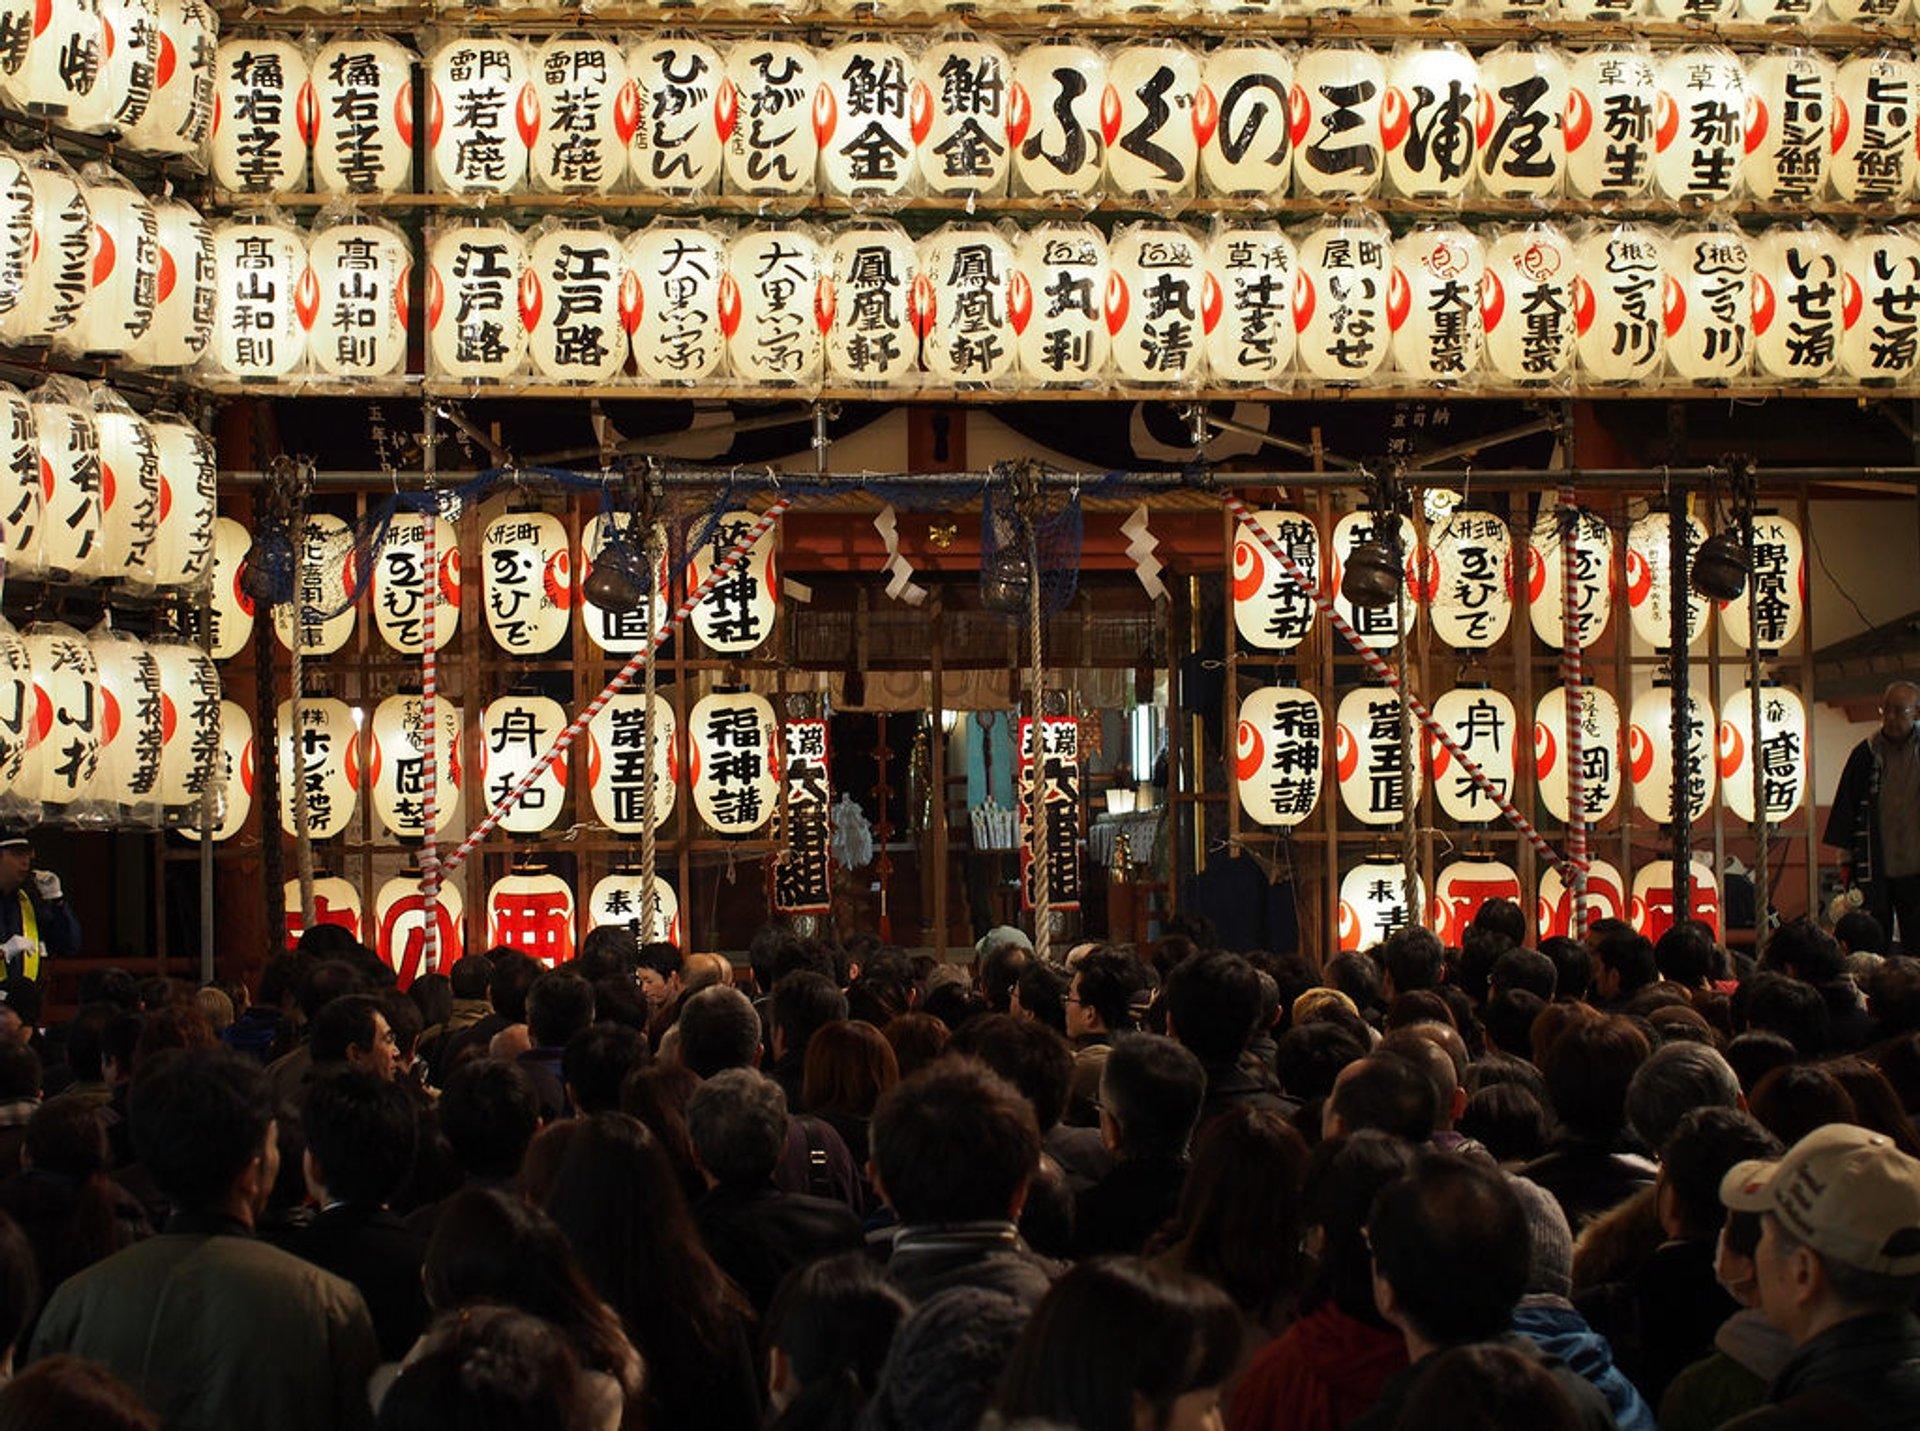 Asakusa Tori No Ichi Fair in Tokyo - Best Season 2020